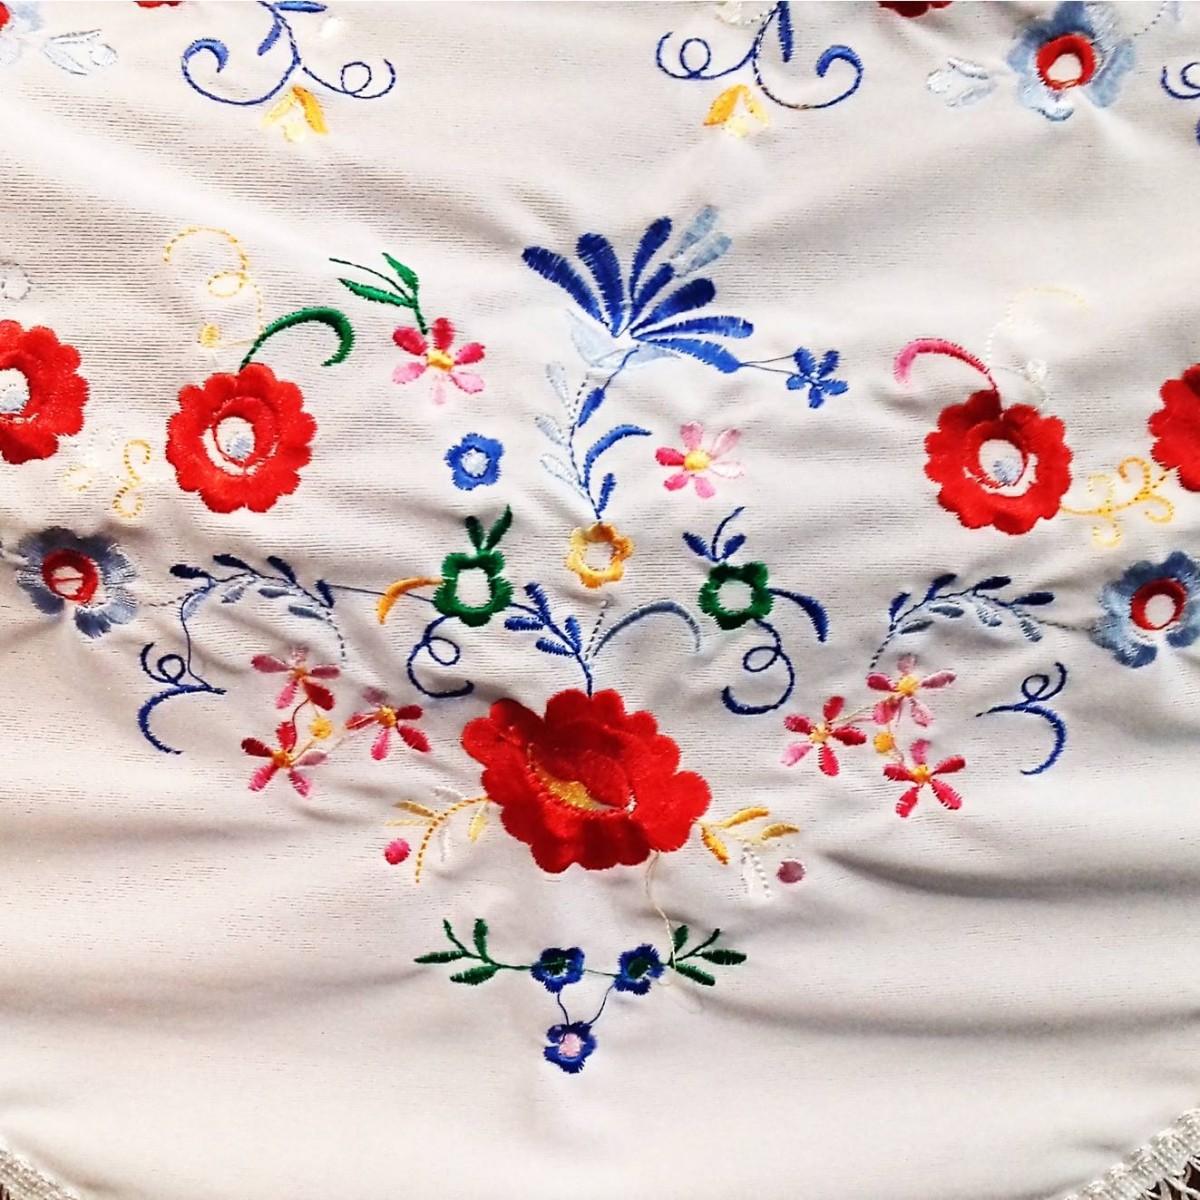 XALE ESPANHOL bordado 160x75 branco flores coloridas flamenco cigano